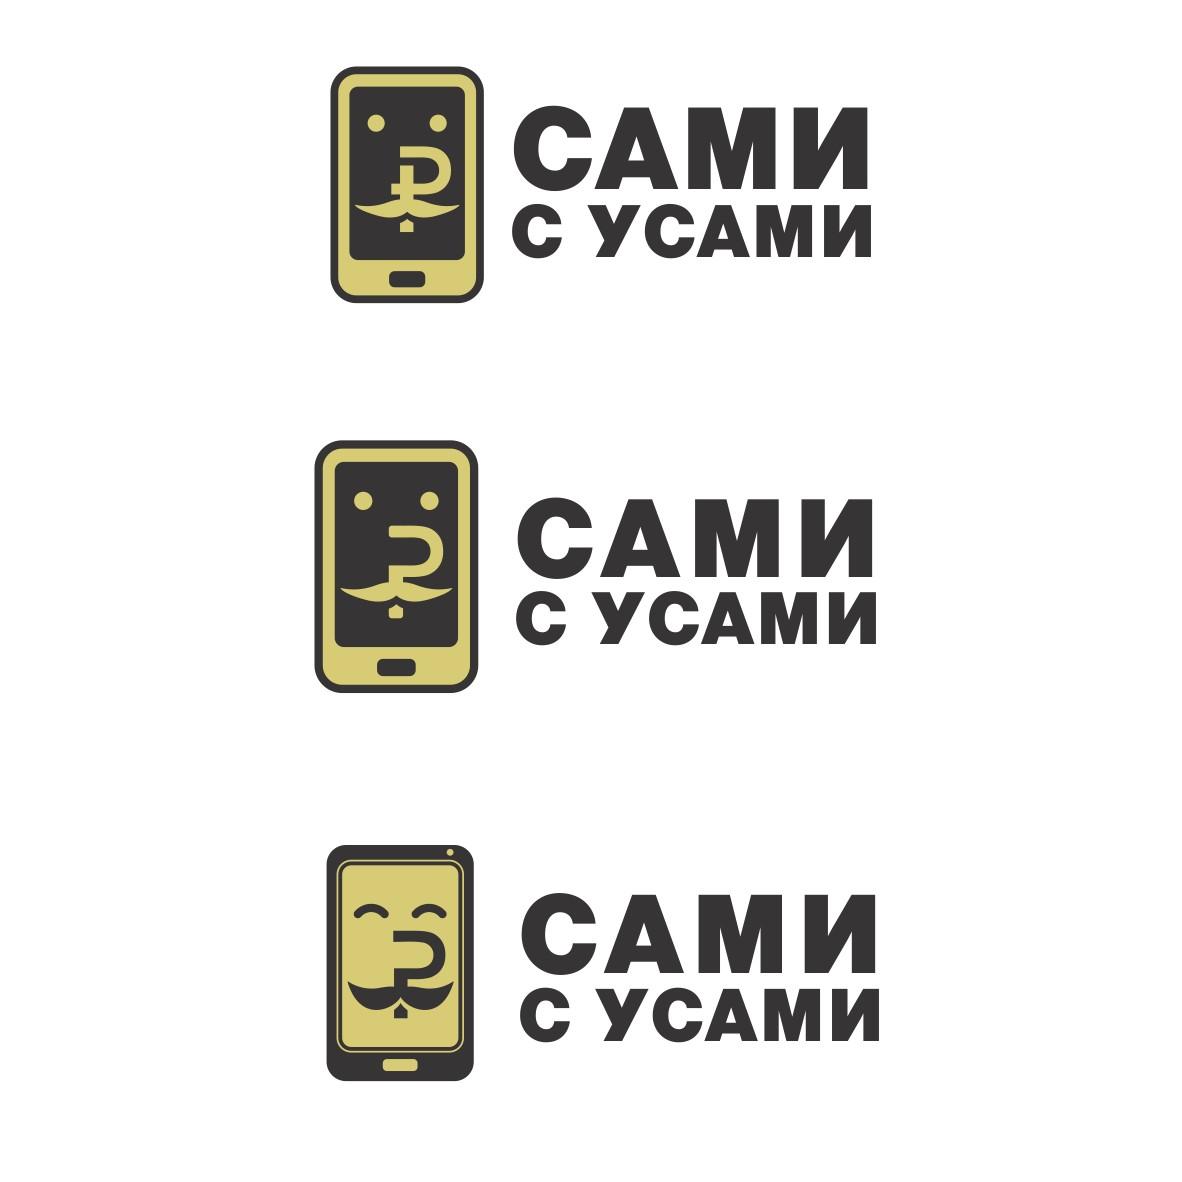 Разработка Логотипа 6 000 руб. фото f_95658f7b4be4c728.jpg